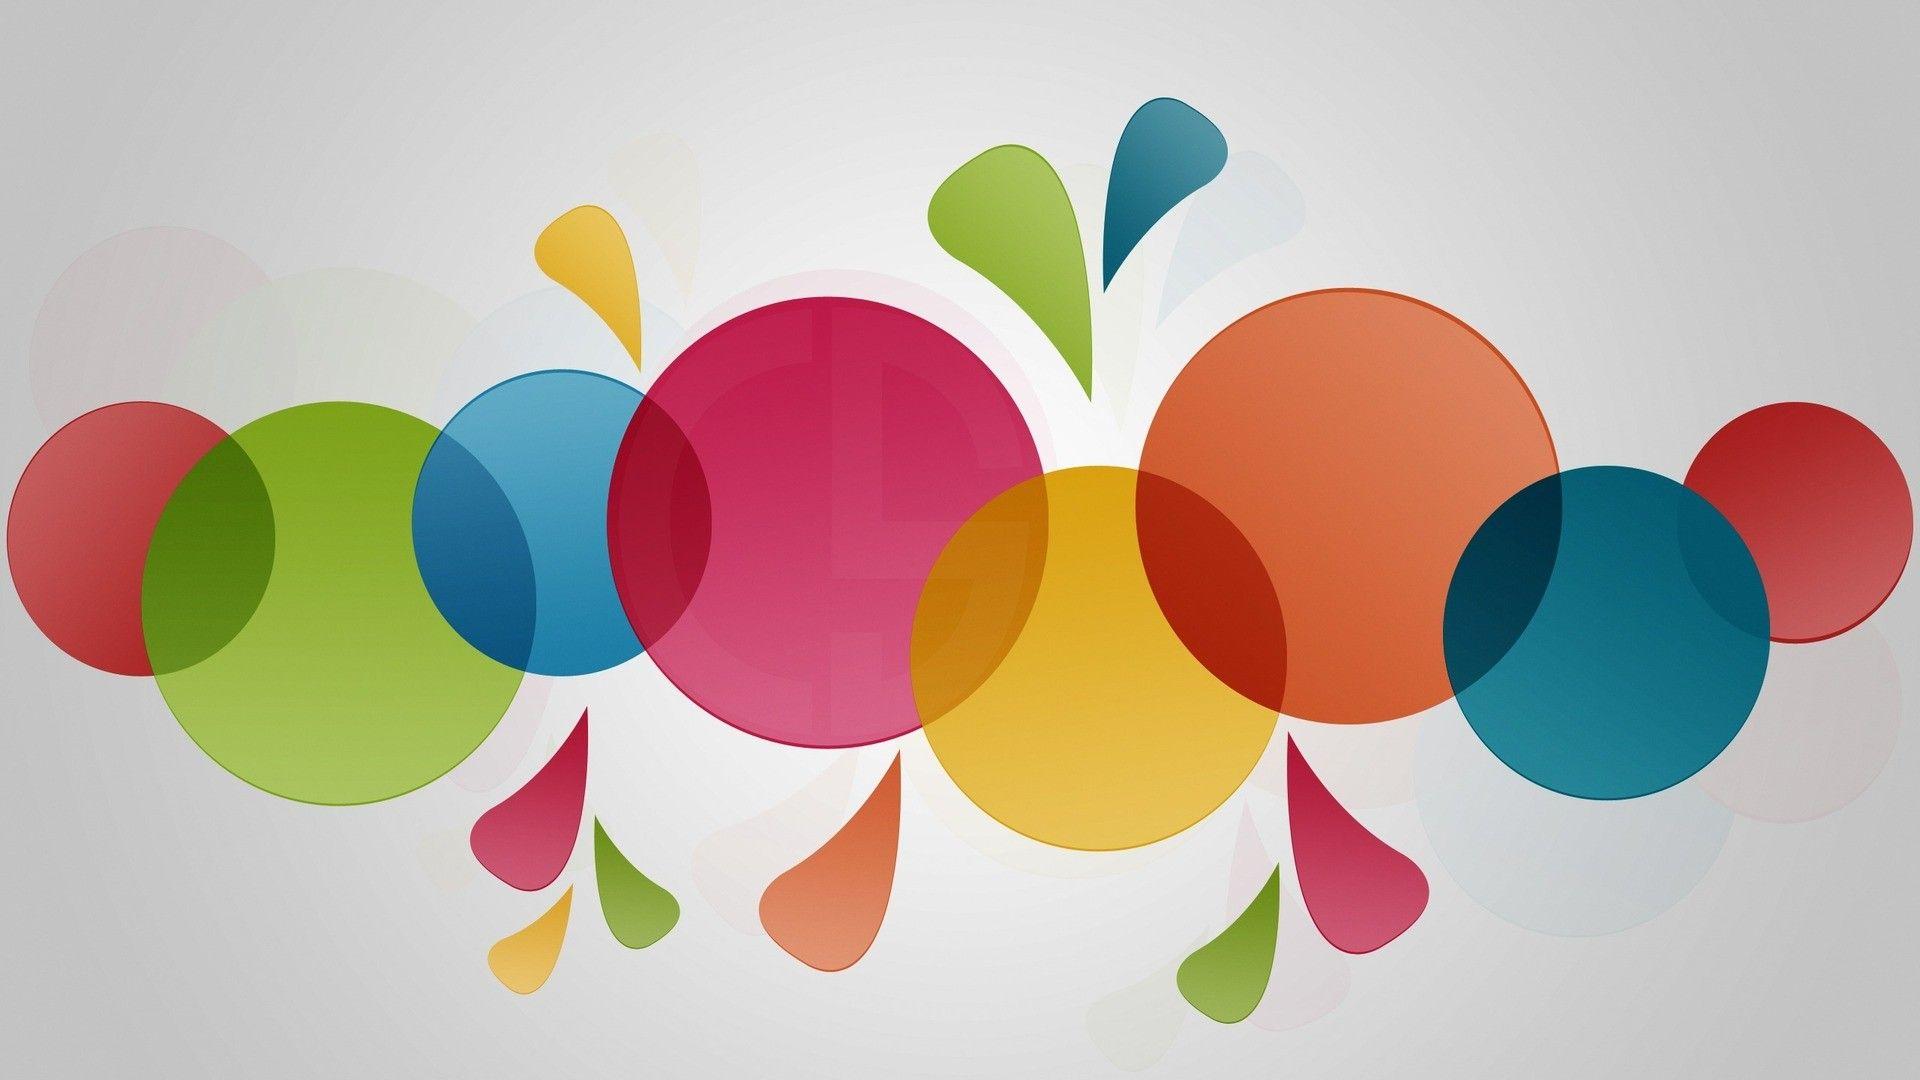 Images For Circles Abstract Creative Design Art Circle Art Art Wallpaper